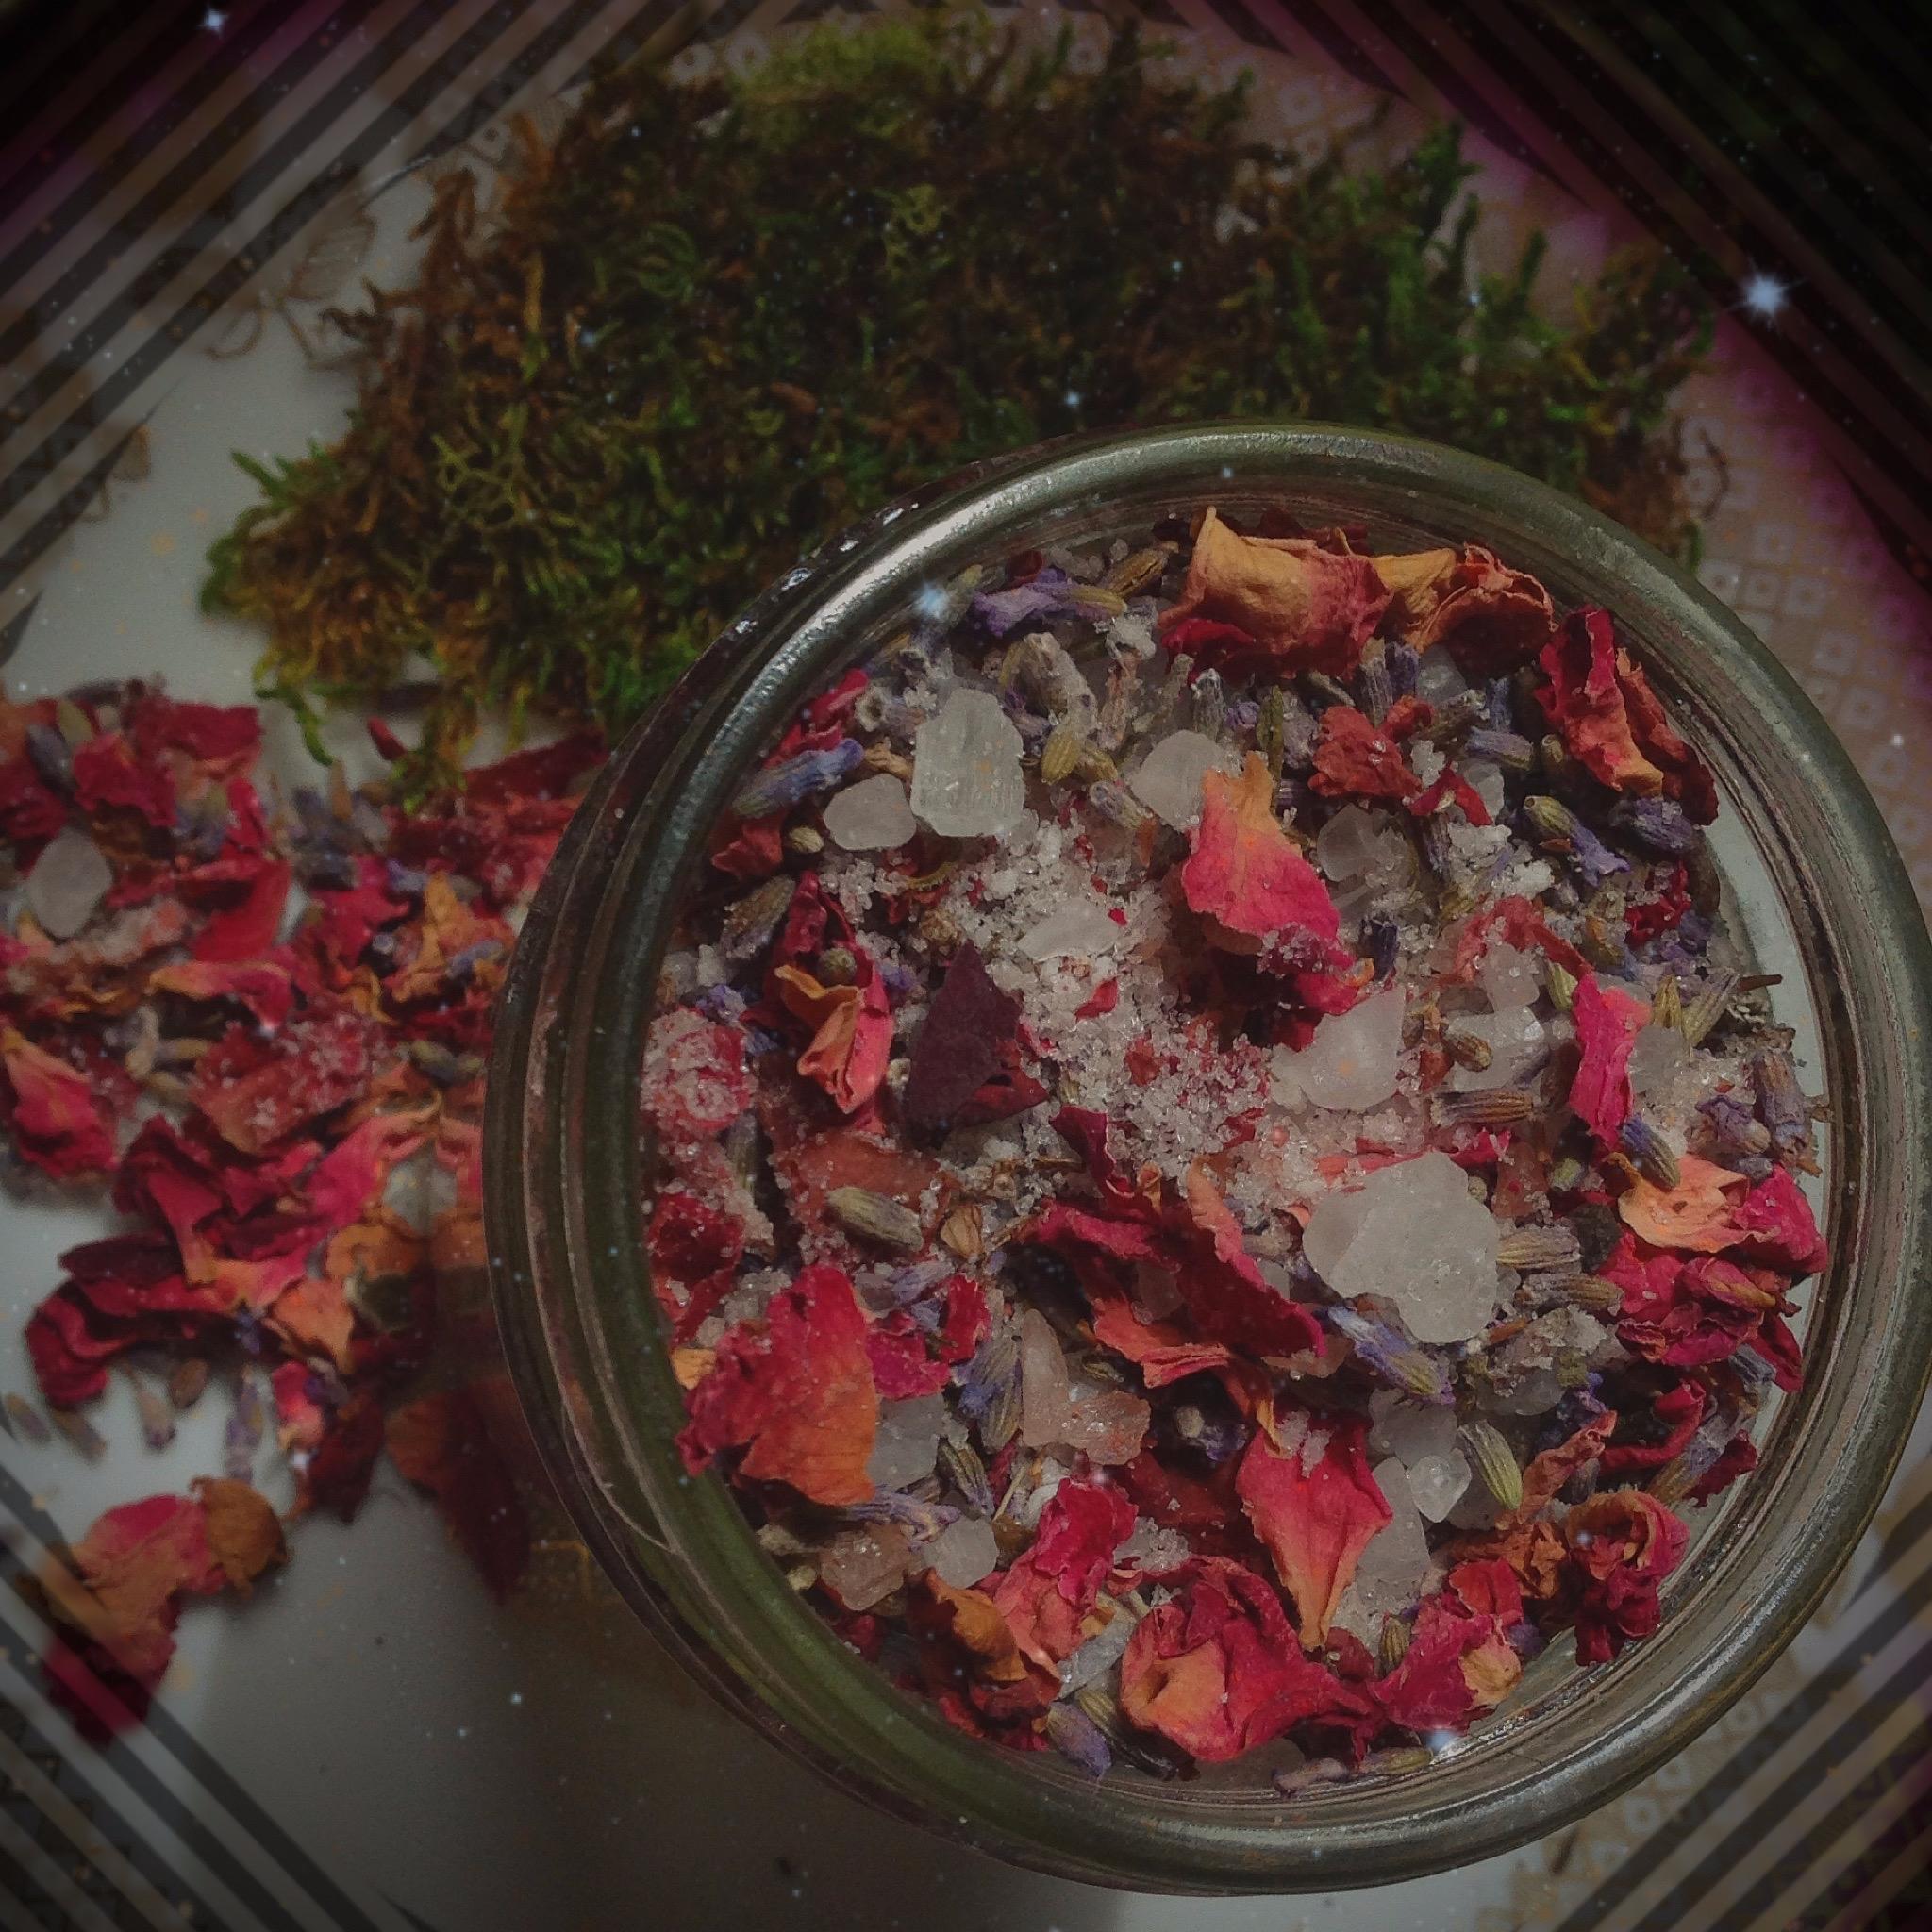 Lavender Arose salt soak, simpl - branchandbeak | ello